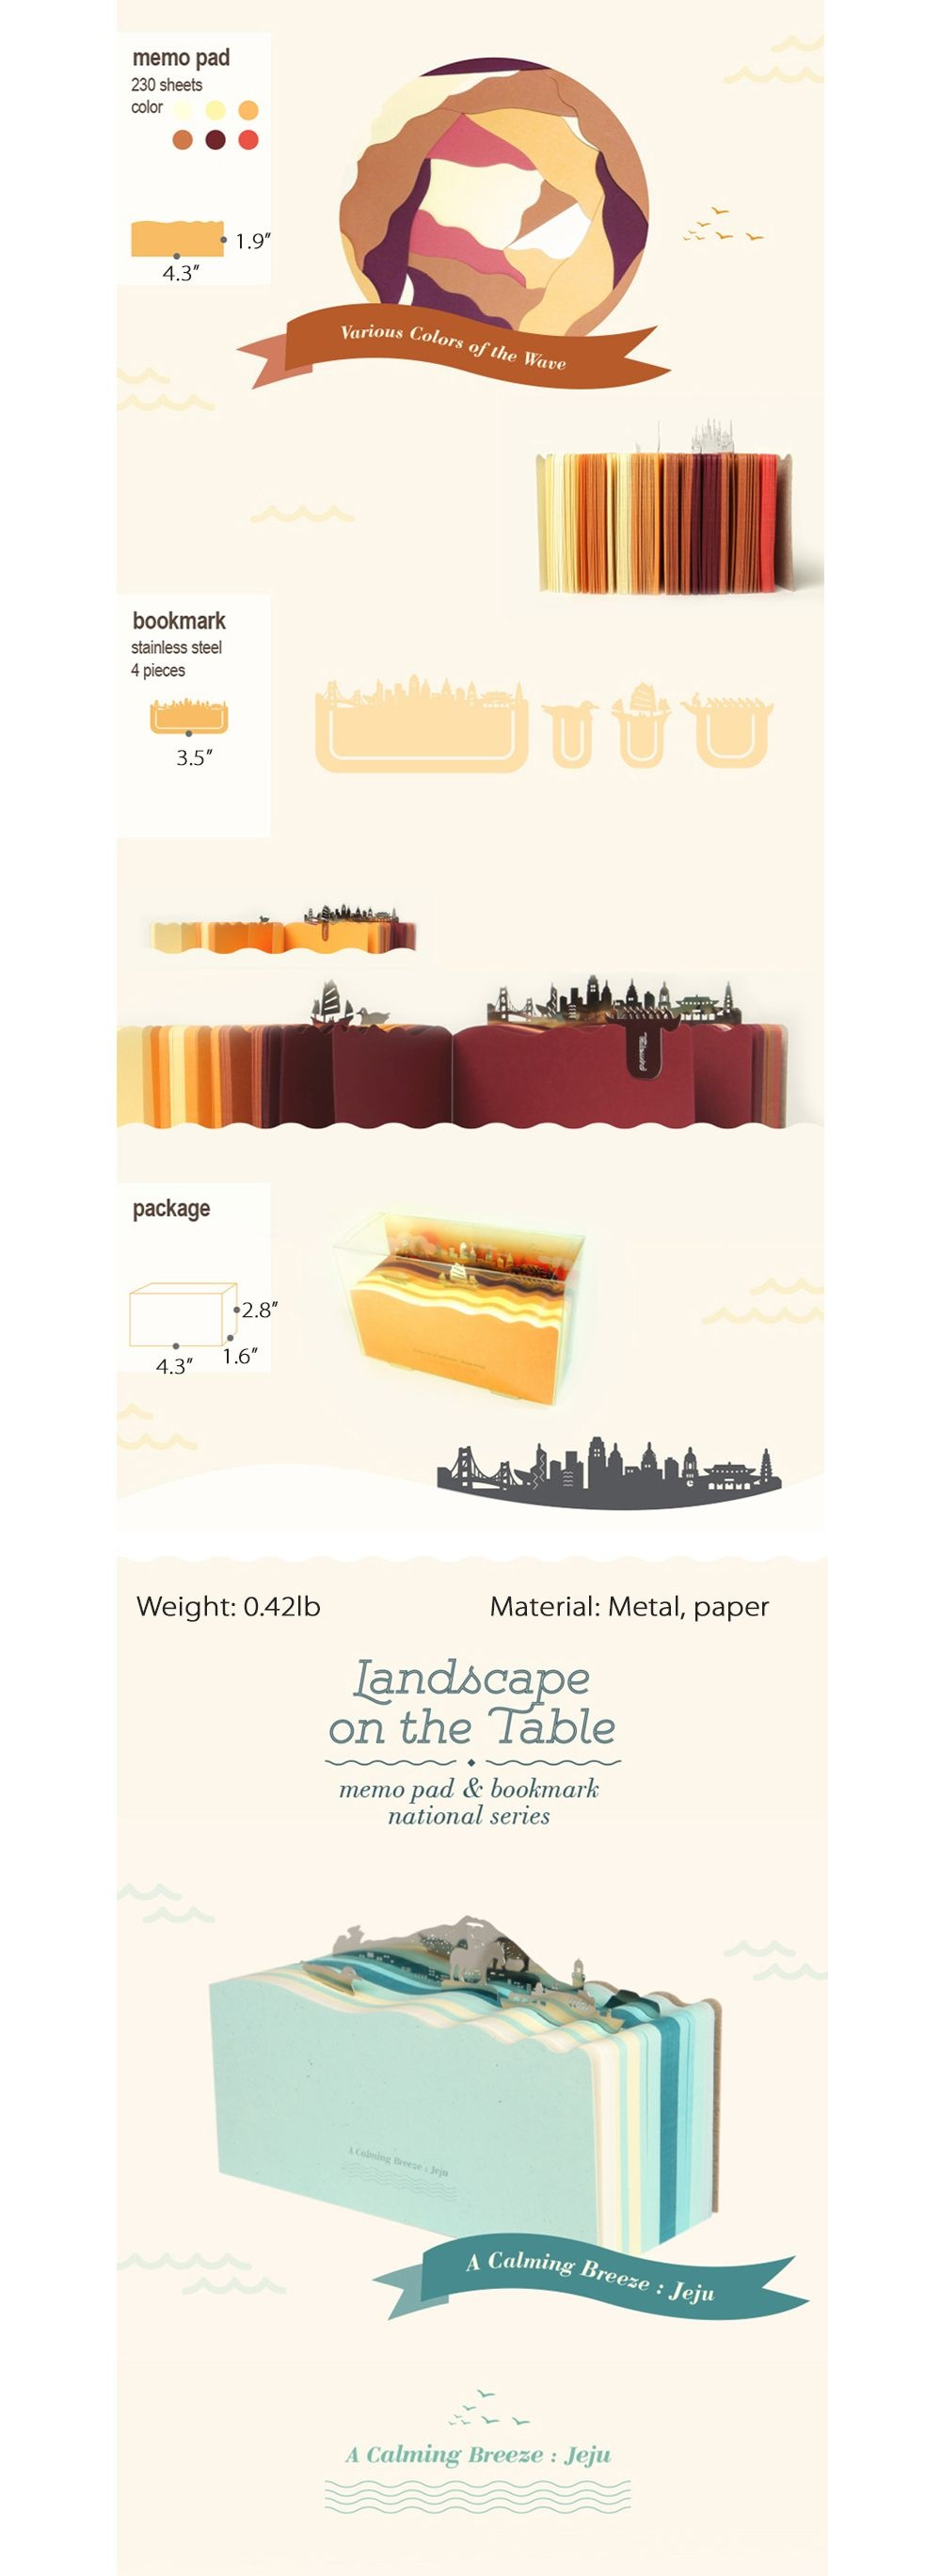 Landscape Post-it Office Supply